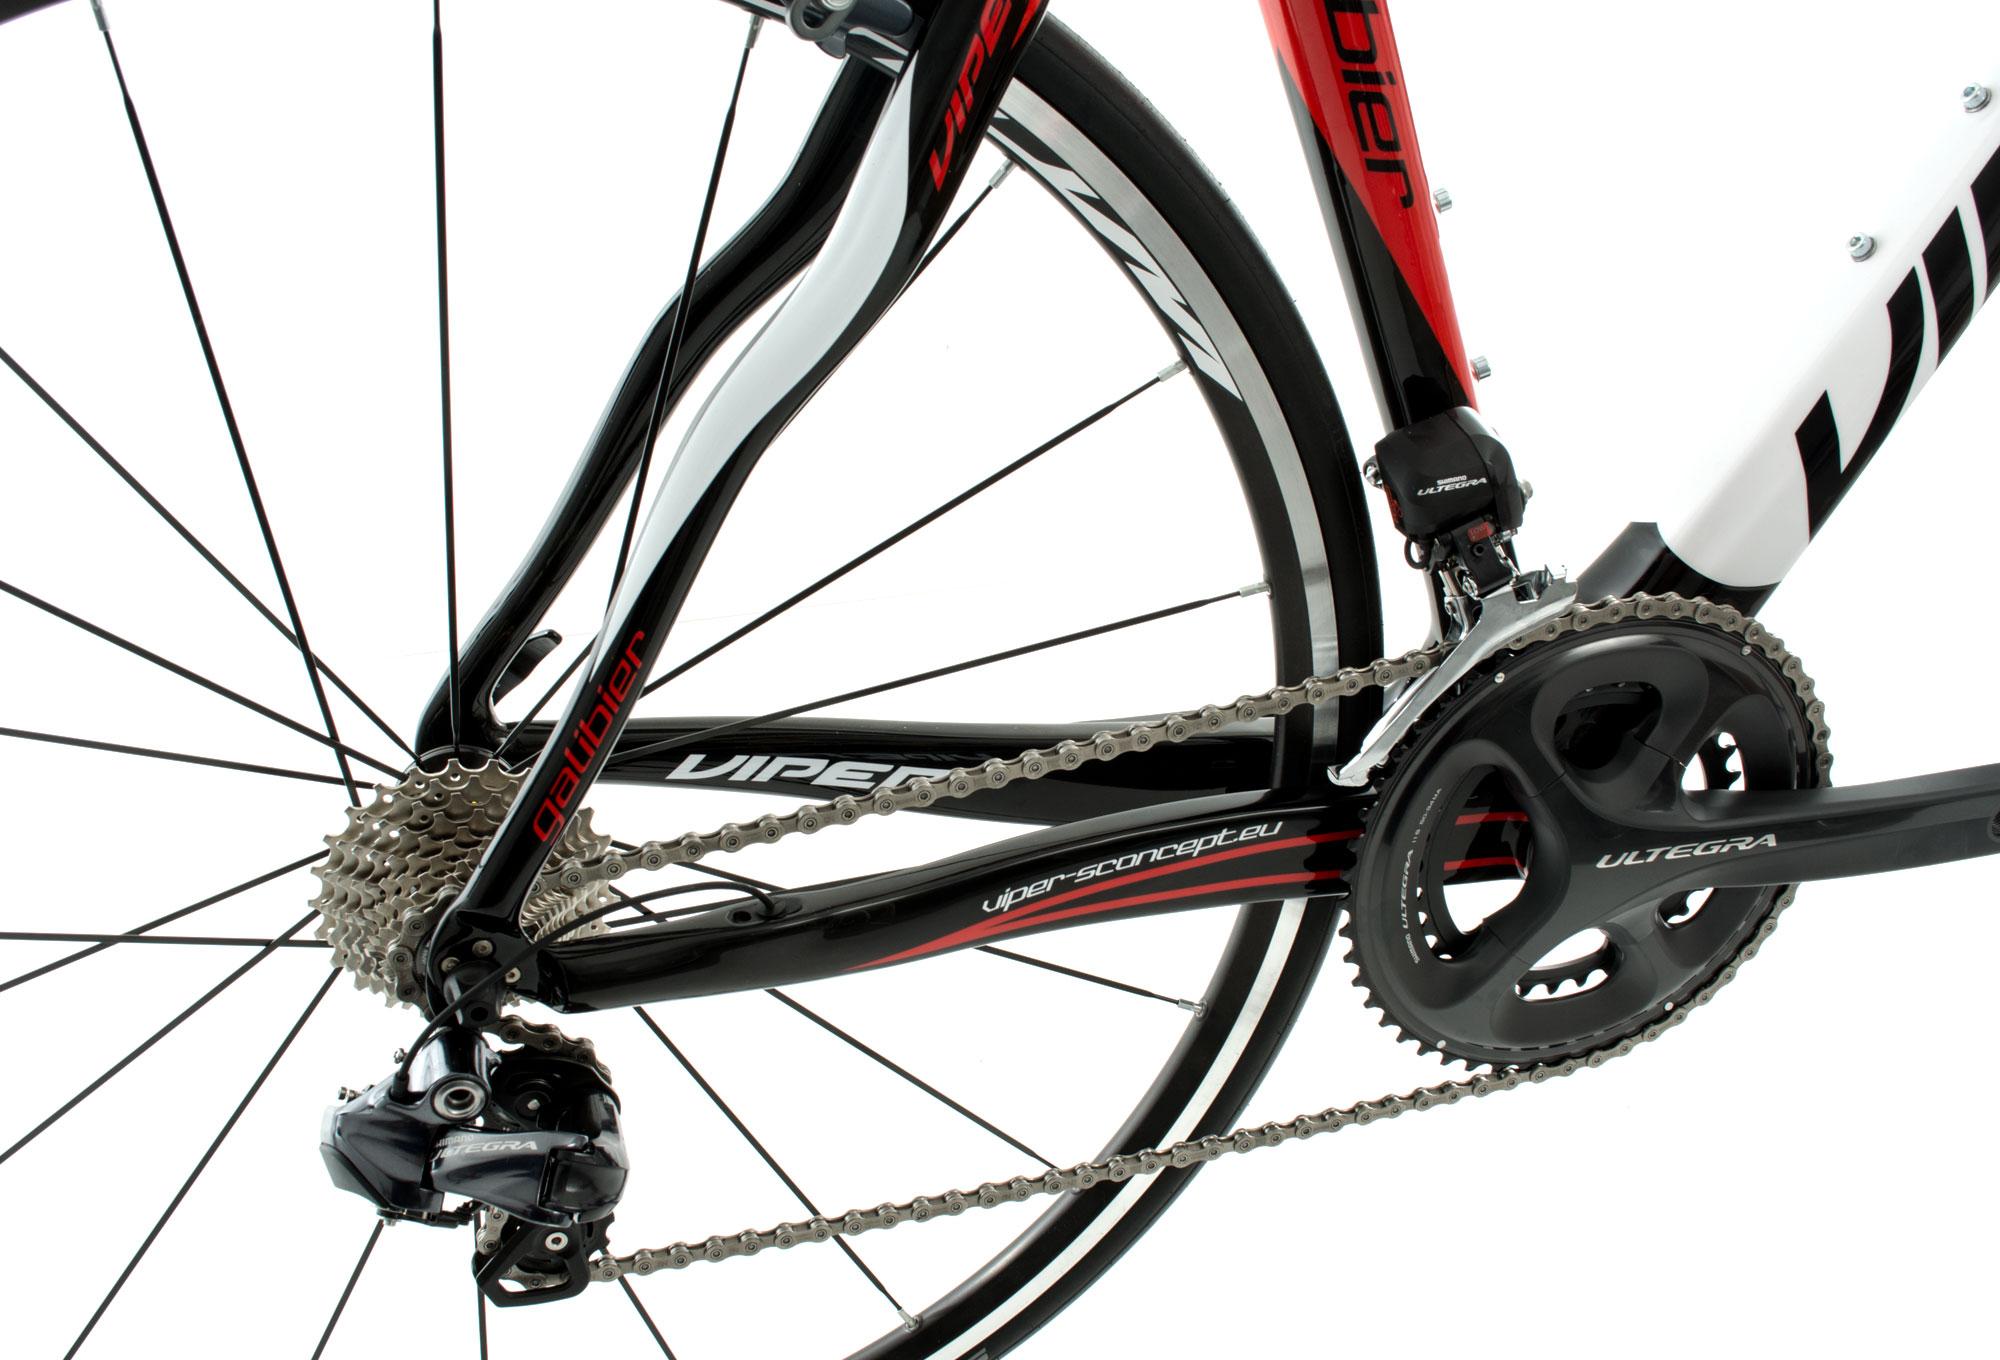 Bicicleta carretera Viper Galibier Carbono Ultegra 11v Di2